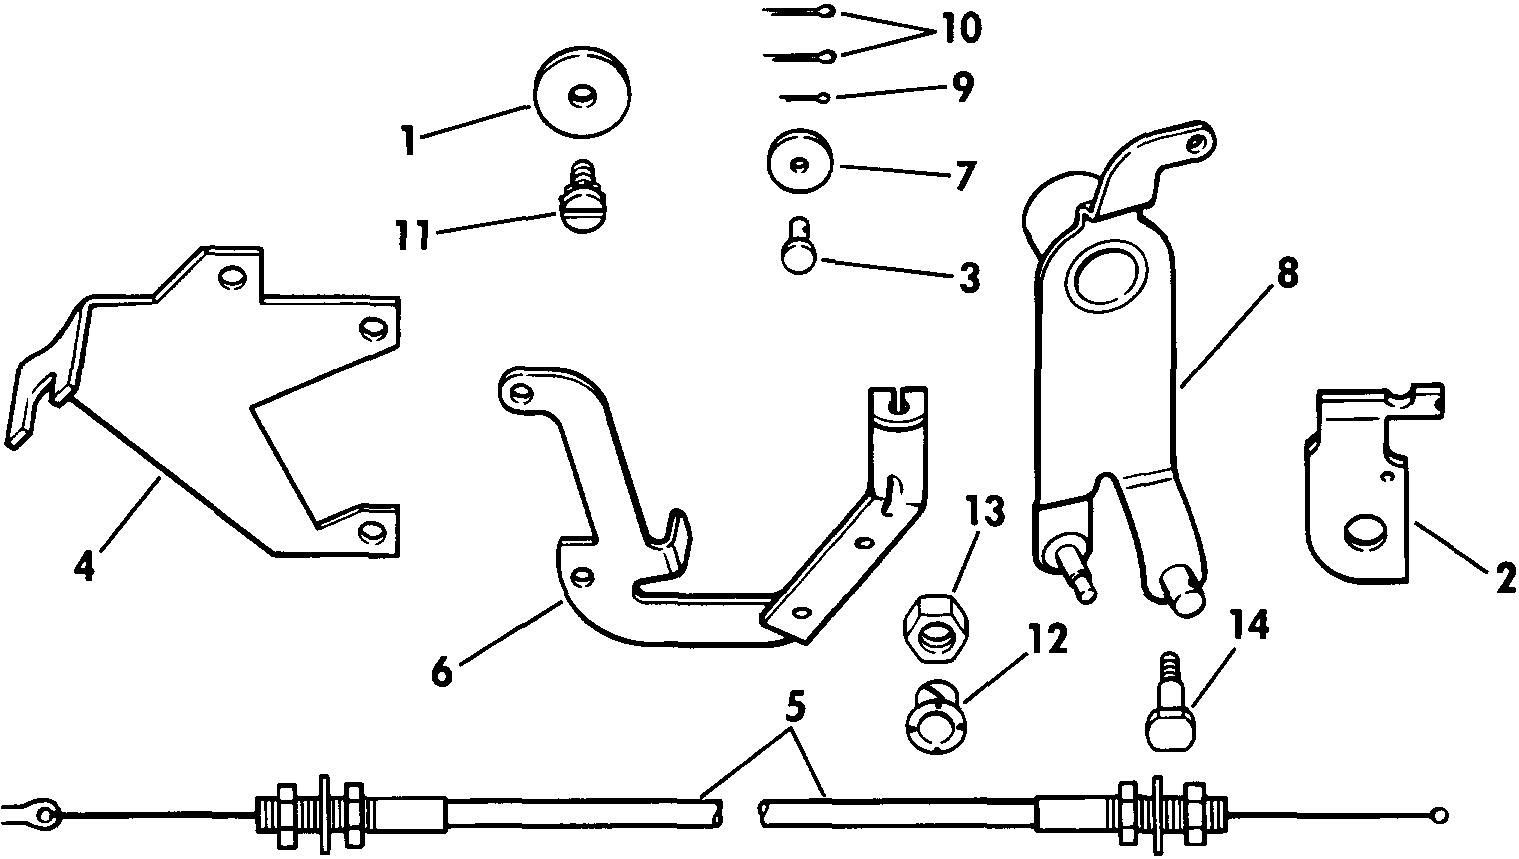 Tilt Lock Release Kit 65, 70, 75, 90, 115 Miscellaneous